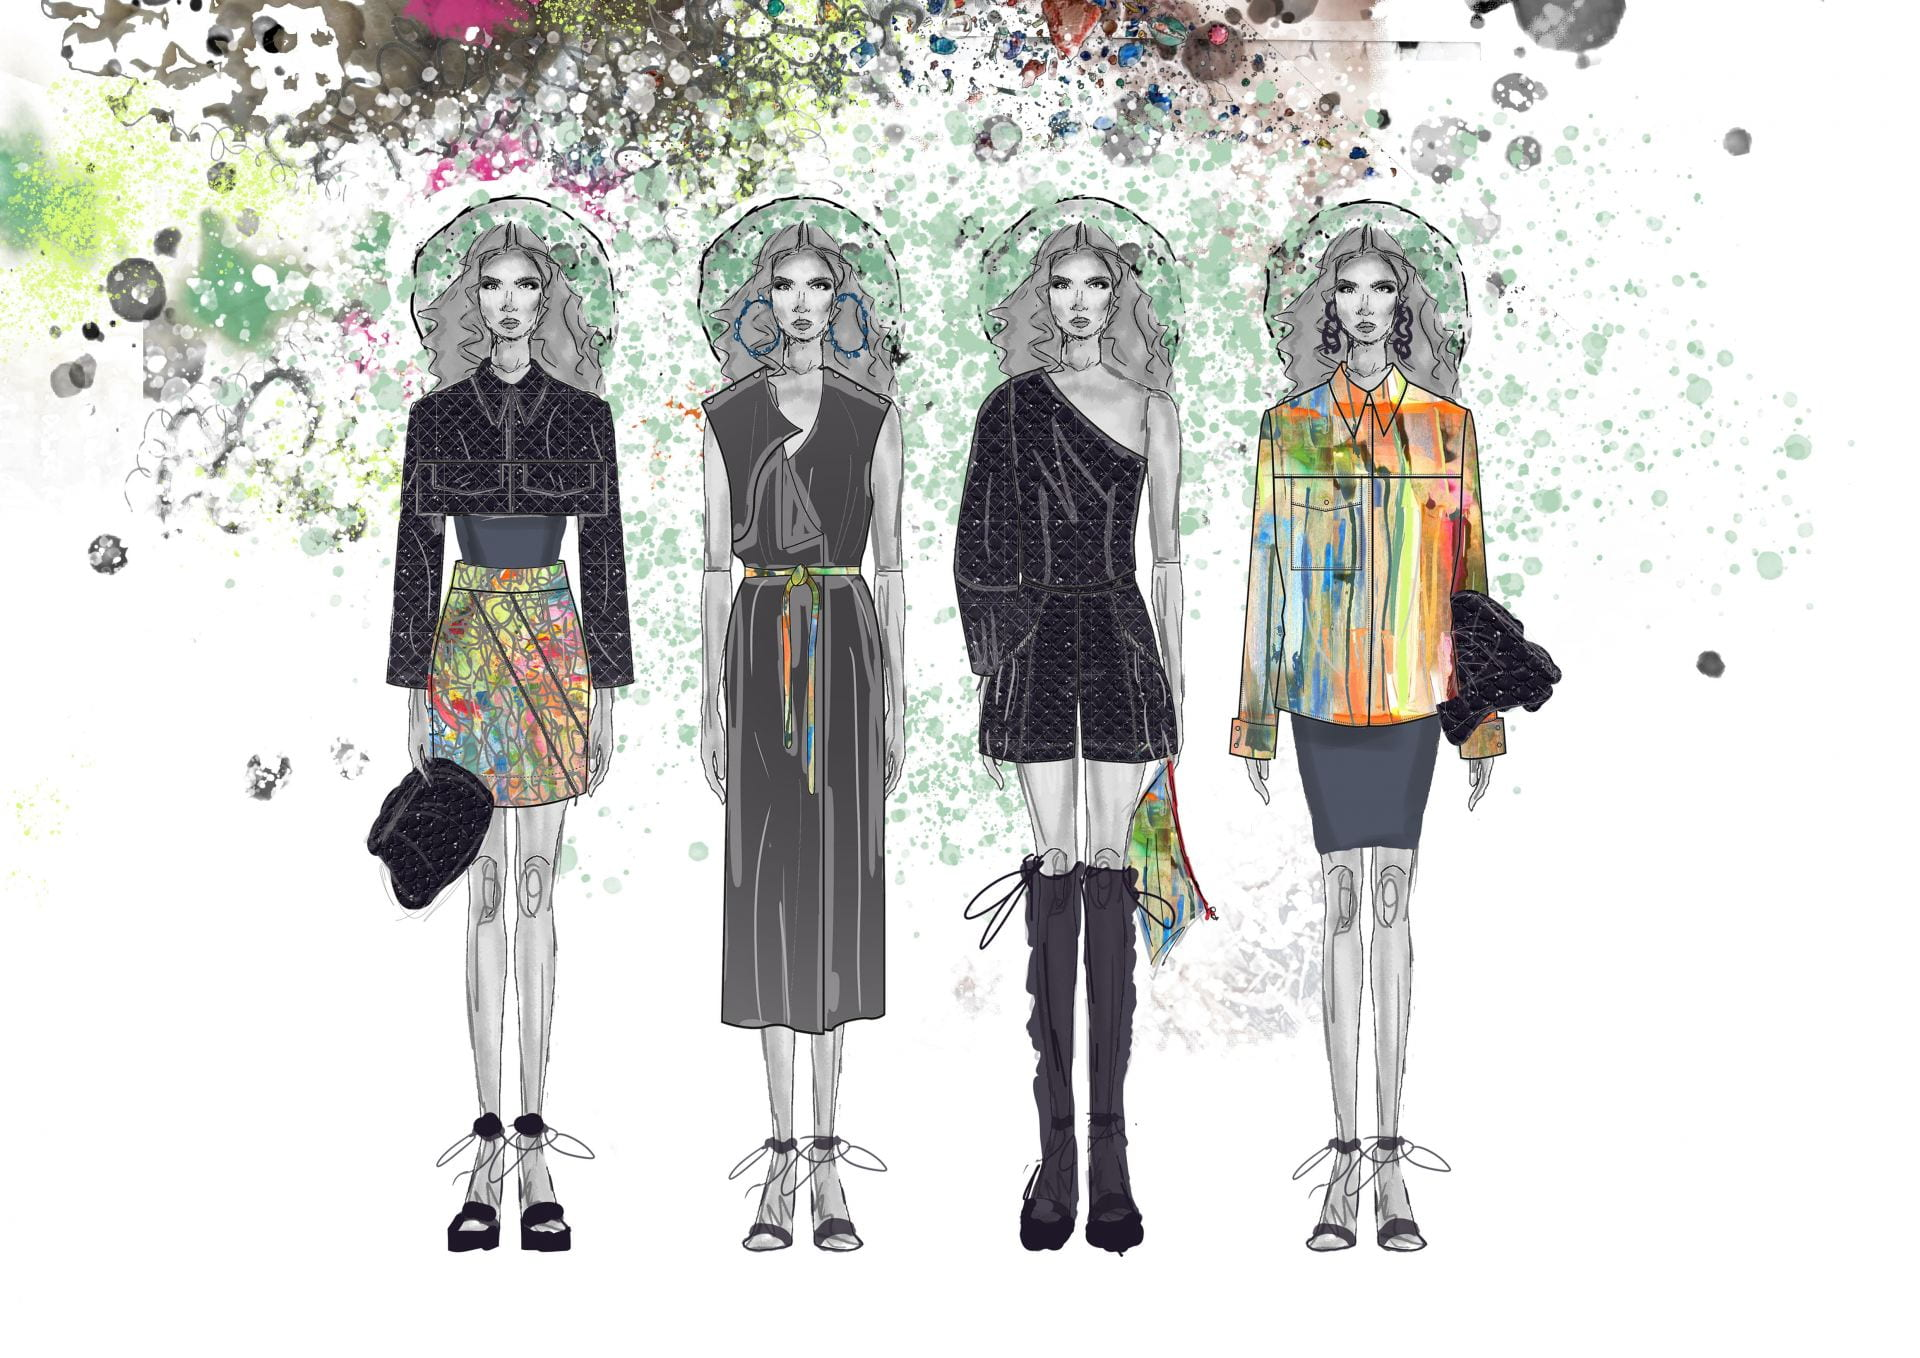 Illustration of models in various garment designs.